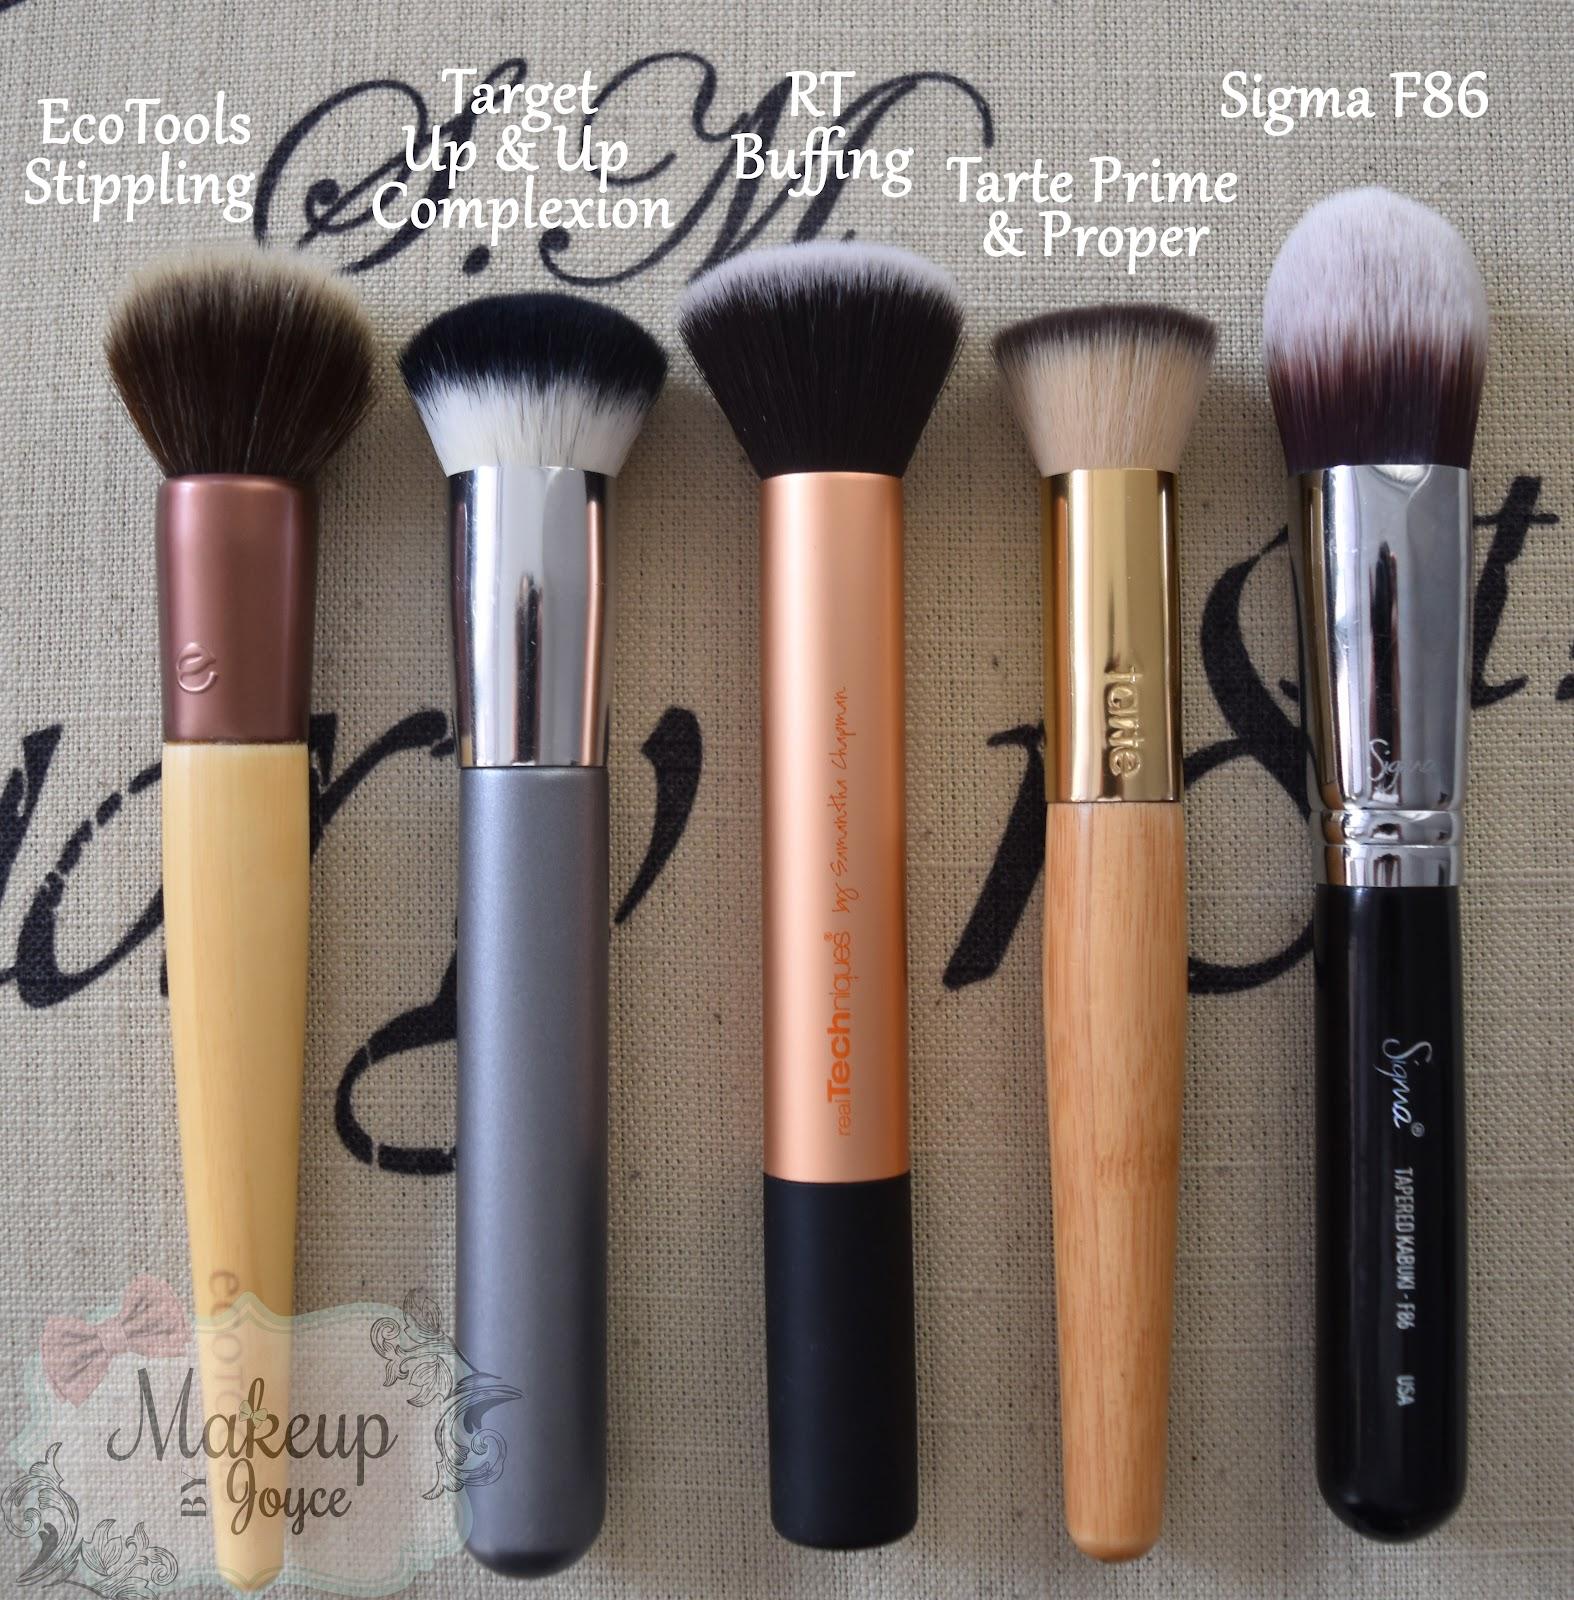 Real Techniques Makeup Brushes Target Wajimakeup Co